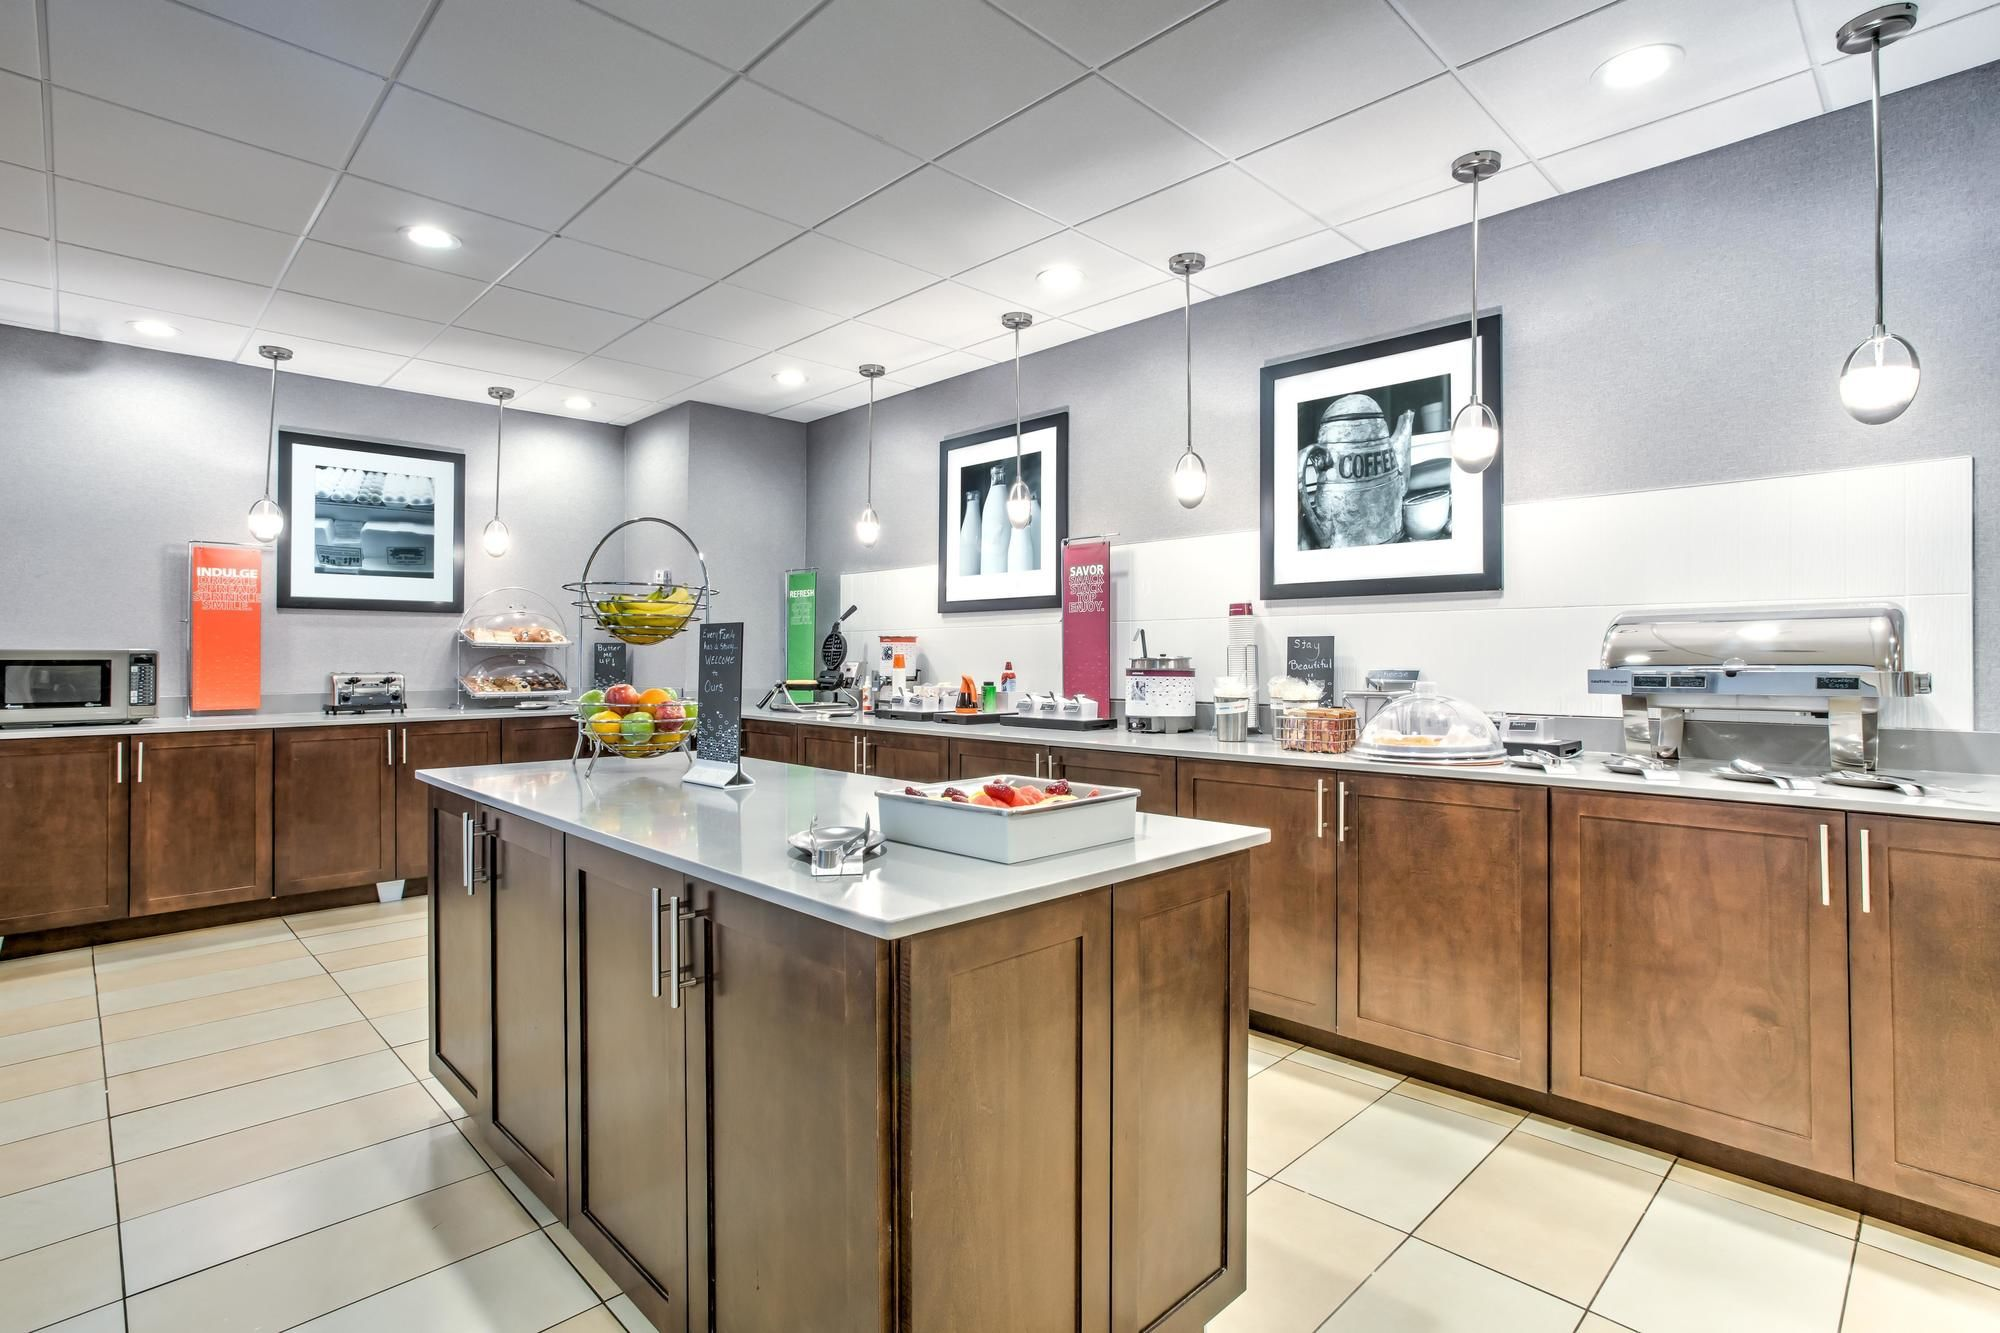 Hampton Inn & Suites Macon I-475